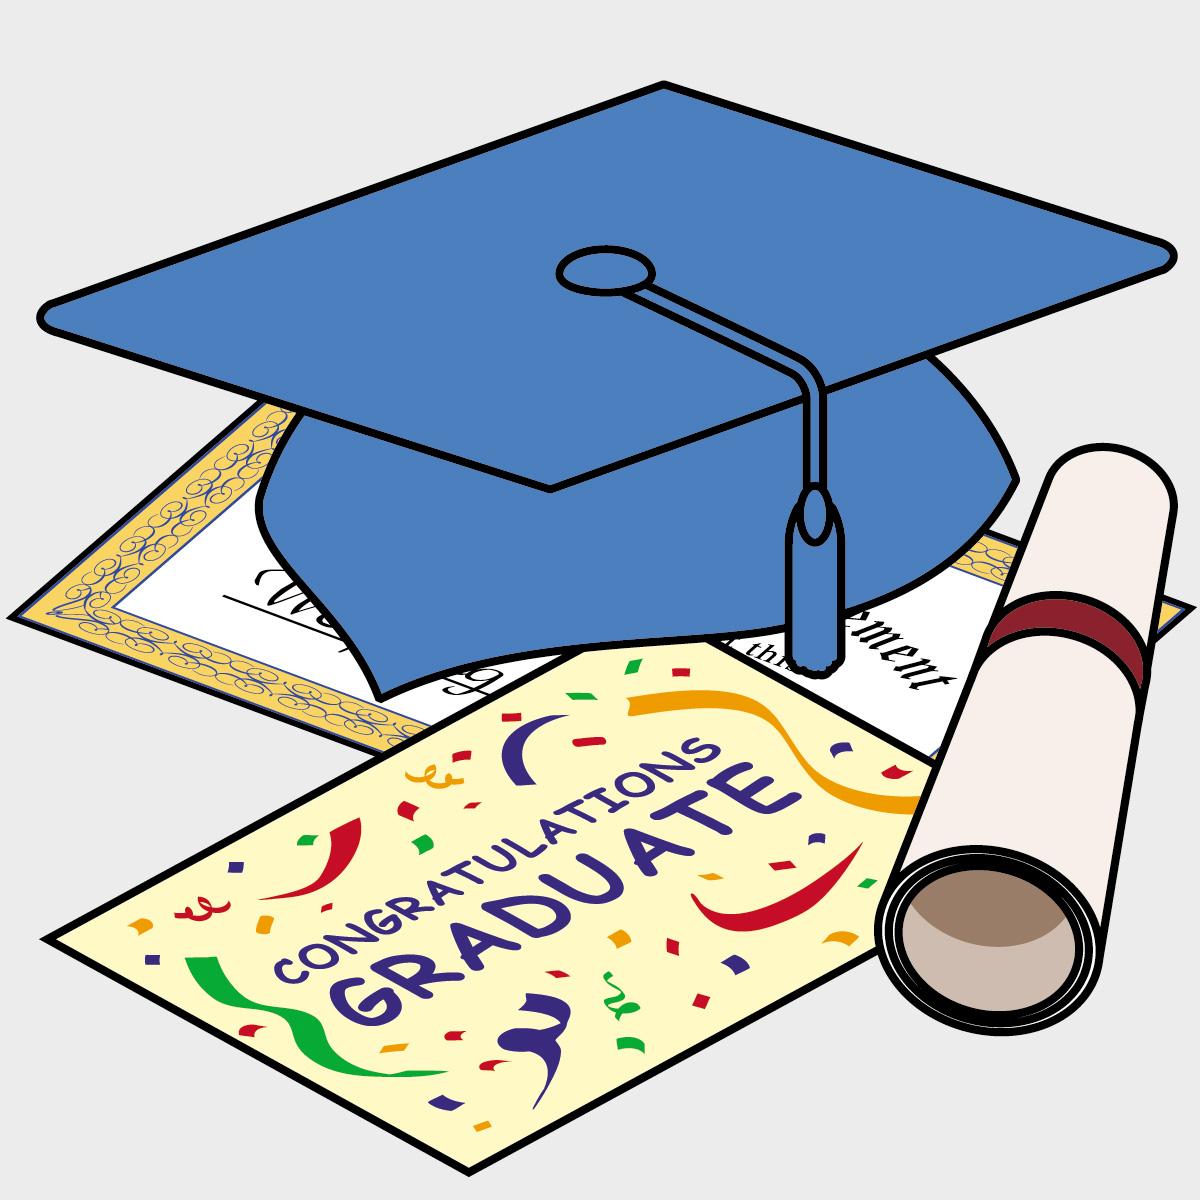 Clip Art High School Clipart clip art senior high school clipart kid 26 graduation free cliparts that you can